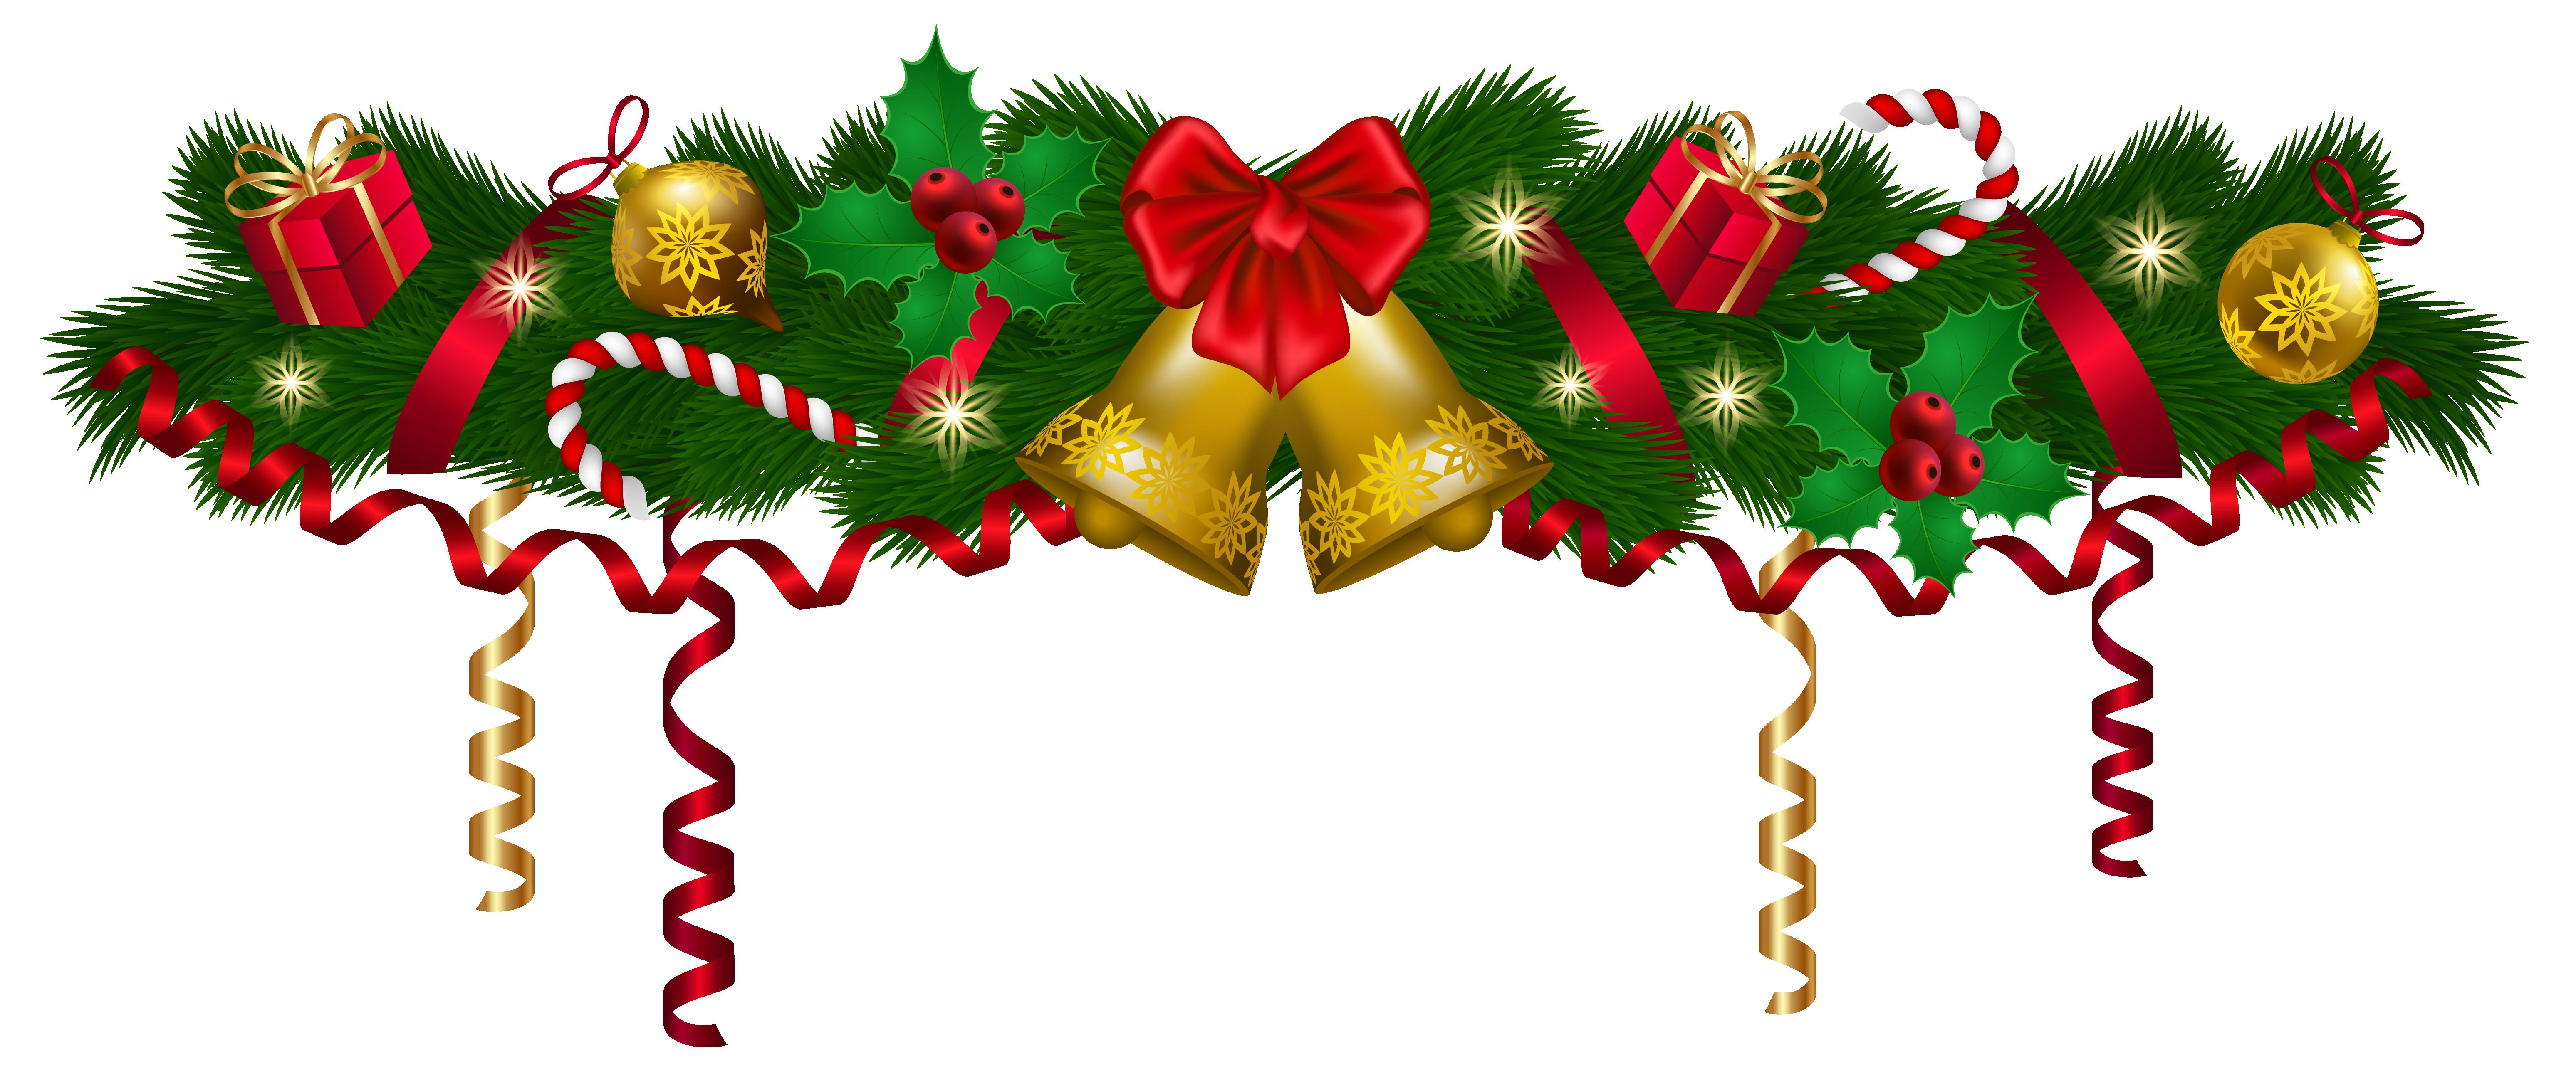 6193x2612 Christmas Deco Garland Png Clip Art Imageu200b Gallery Yopriceville